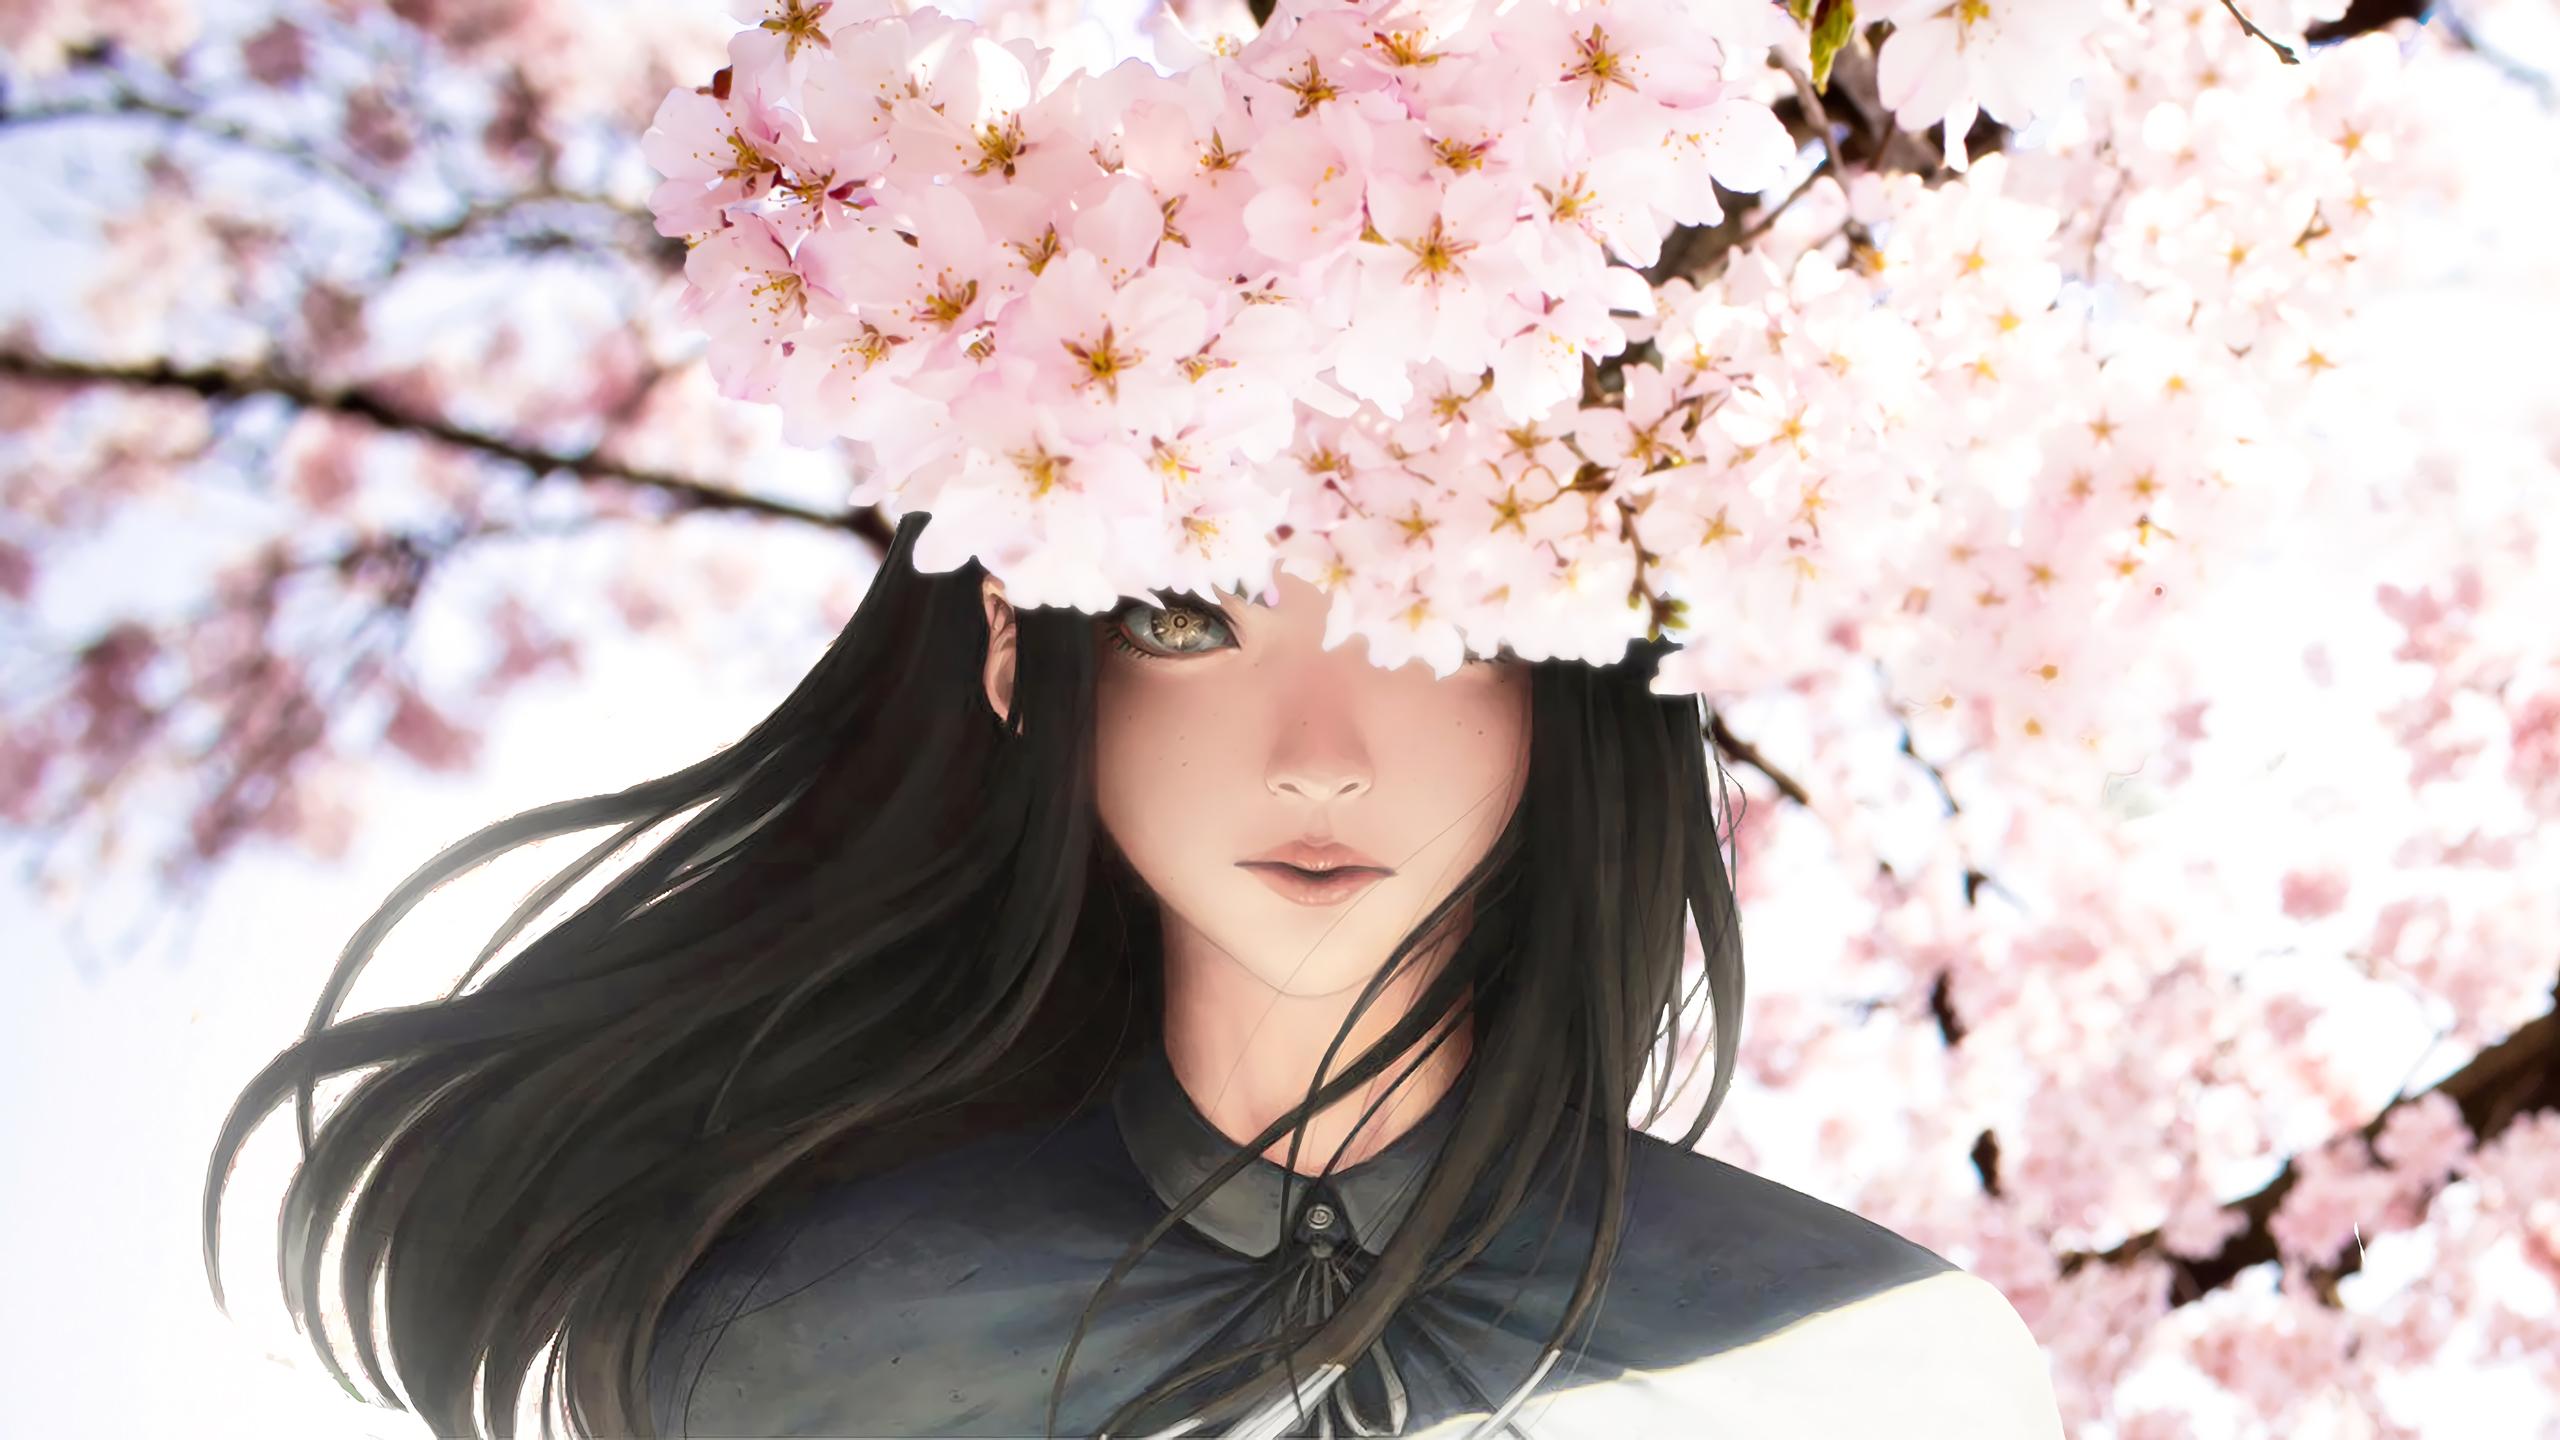 Beautiful Anime Girl - Cherry Blossom Beautiful Anime , HD Wallpaper & Backgrounds